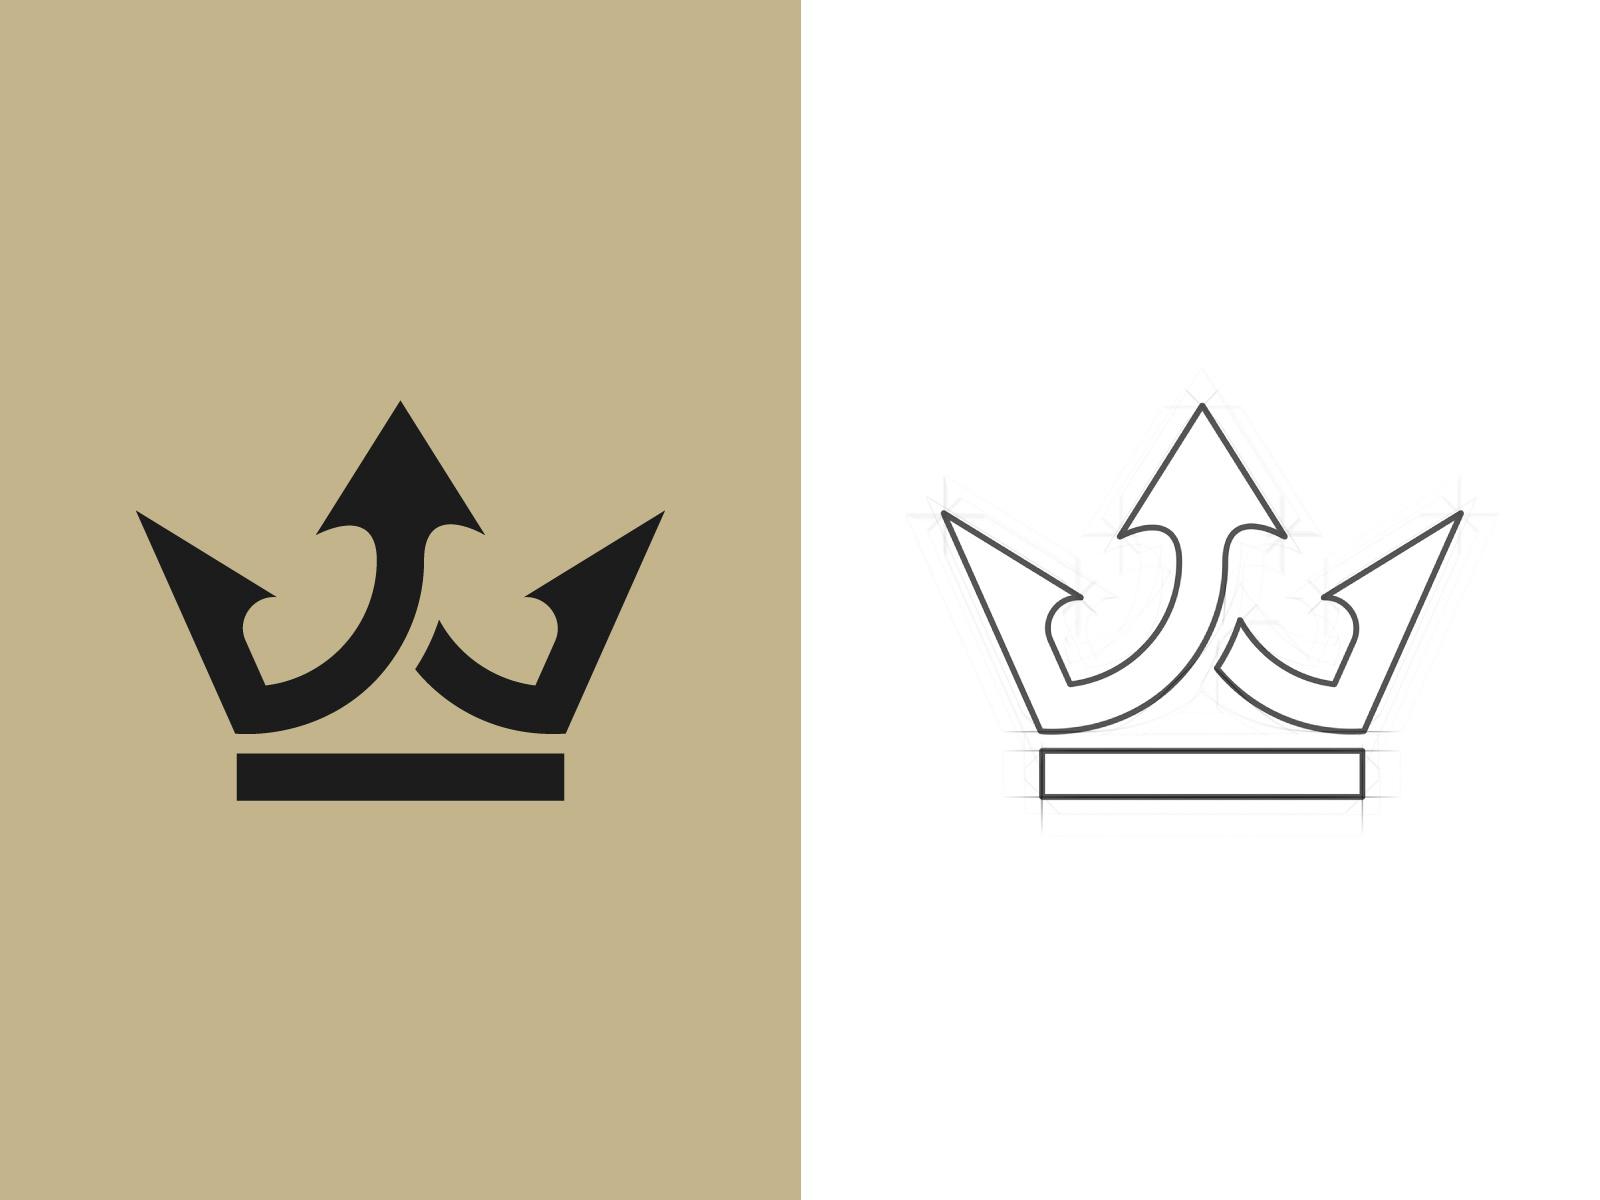 Royal Crown Logo by Alin Ionita on Dribbble.